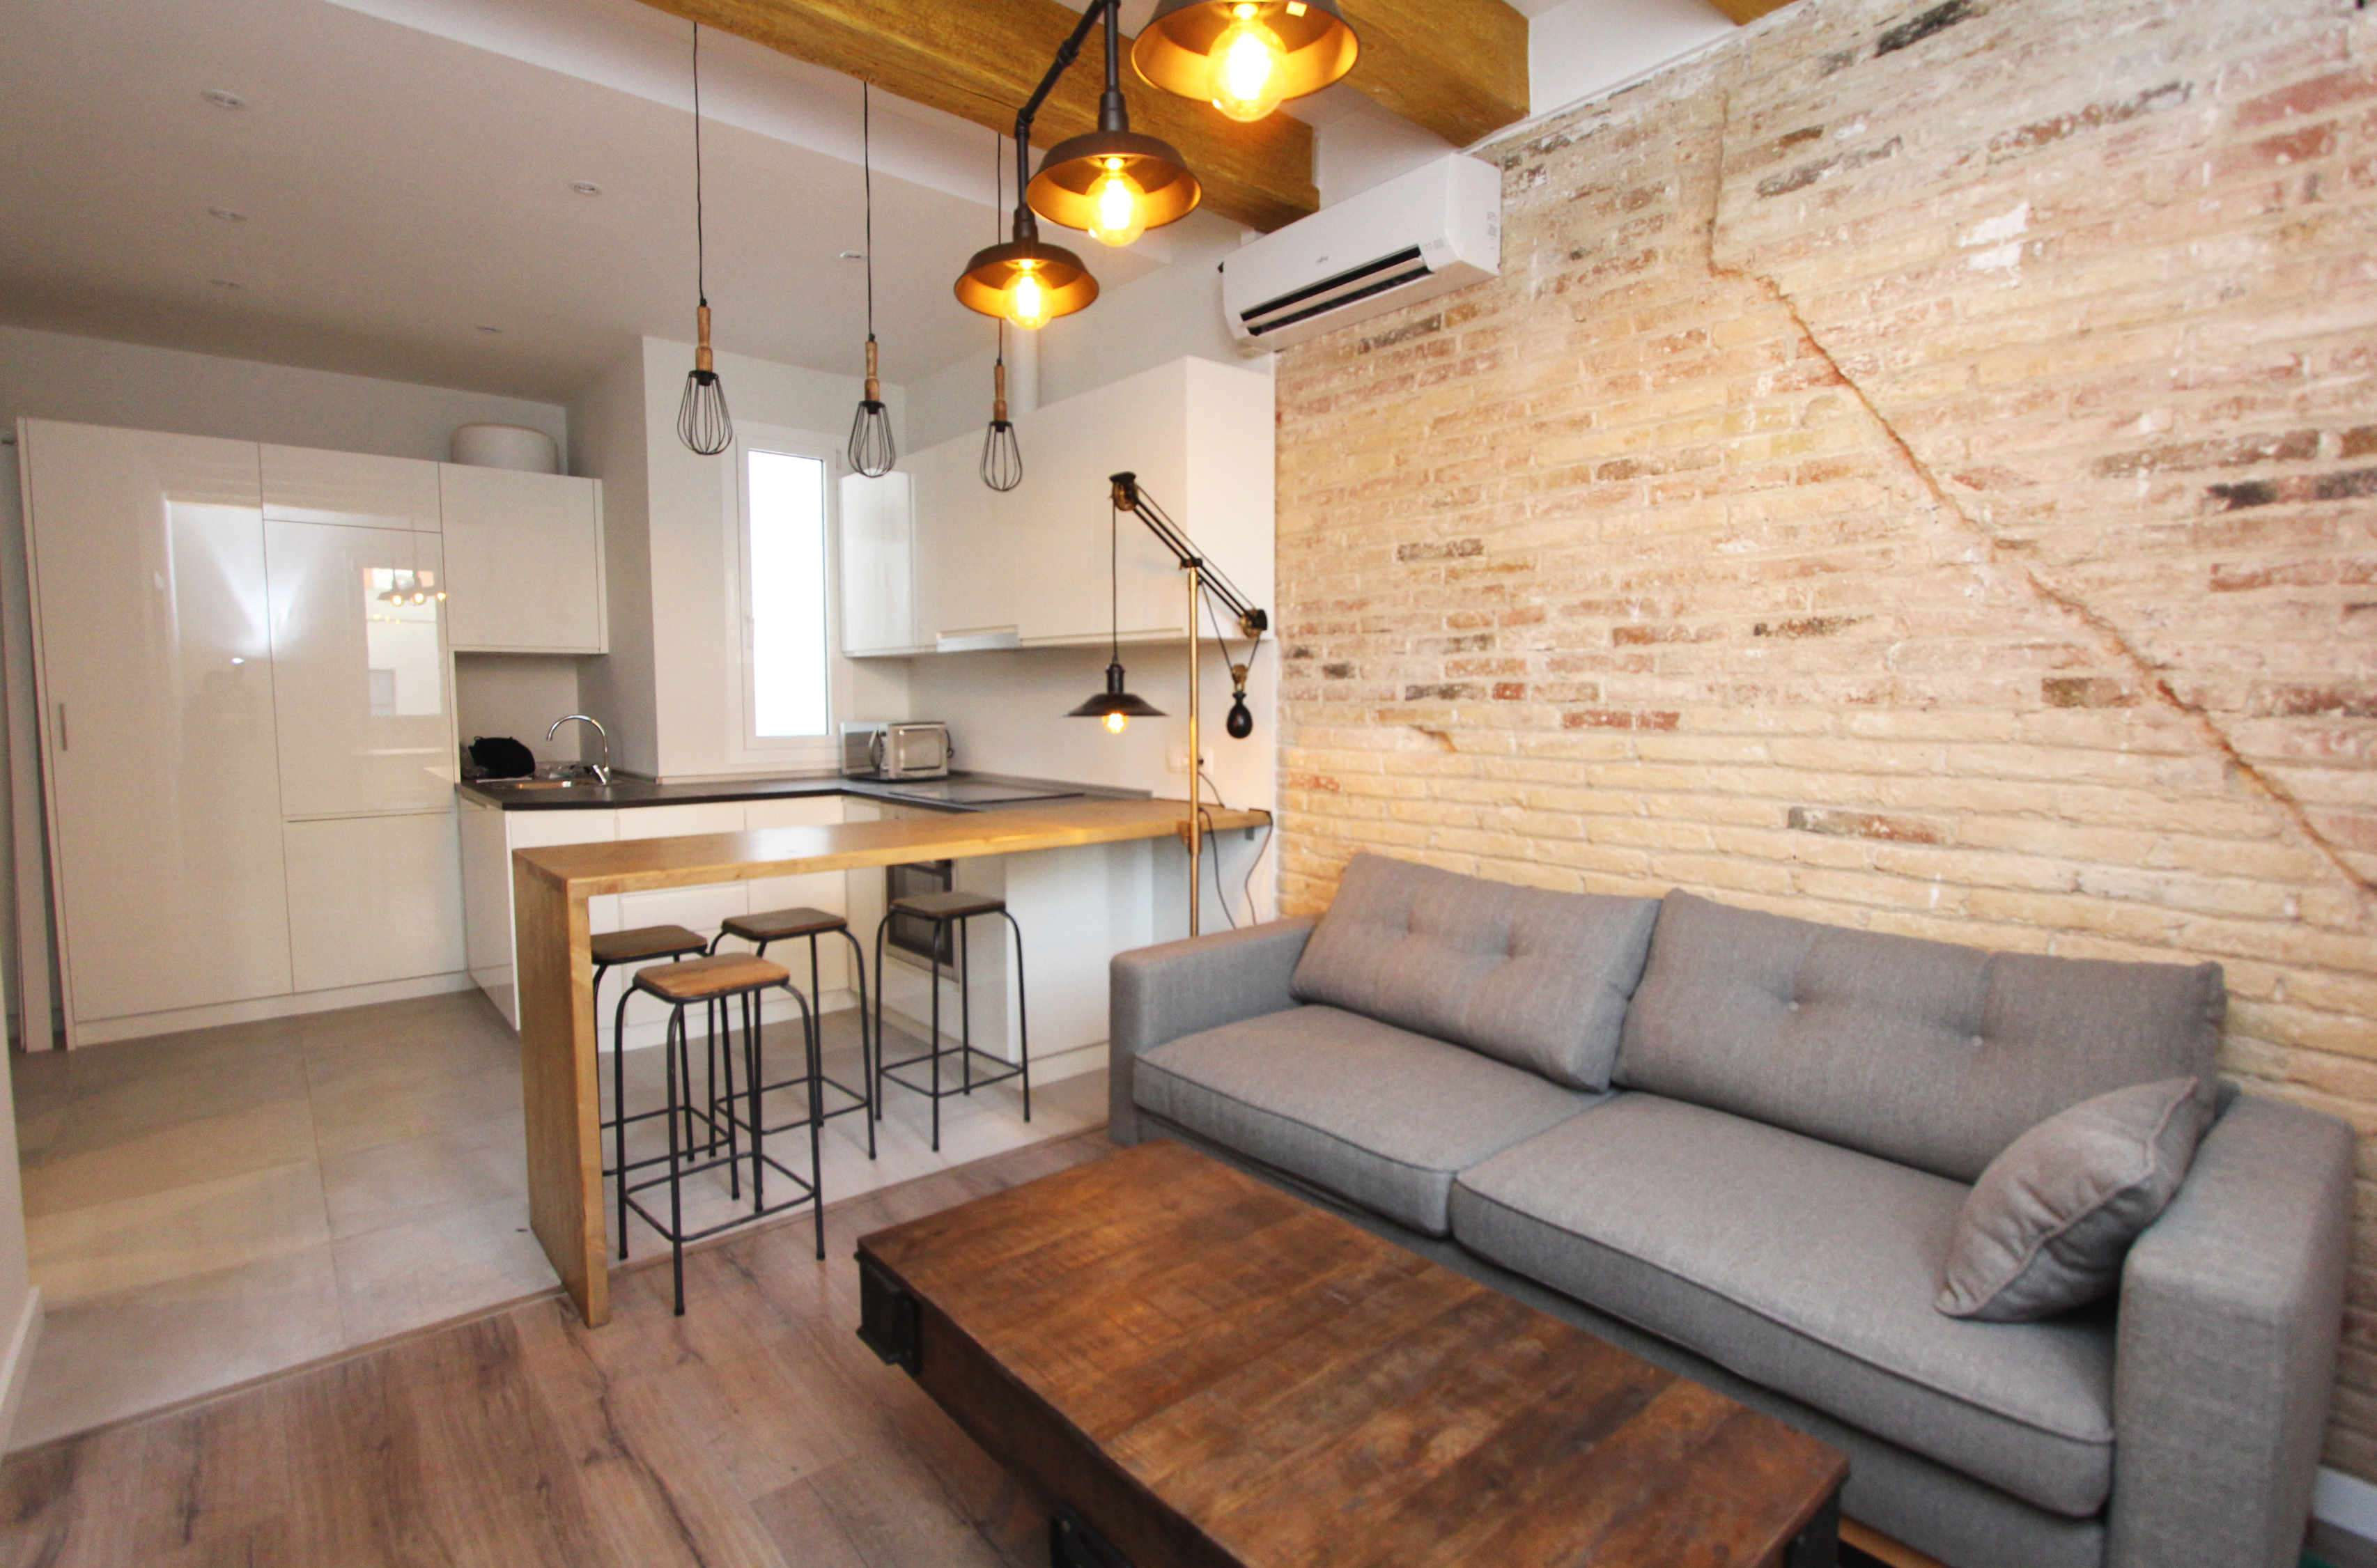 Industrial style apartment near Sagrada Familia